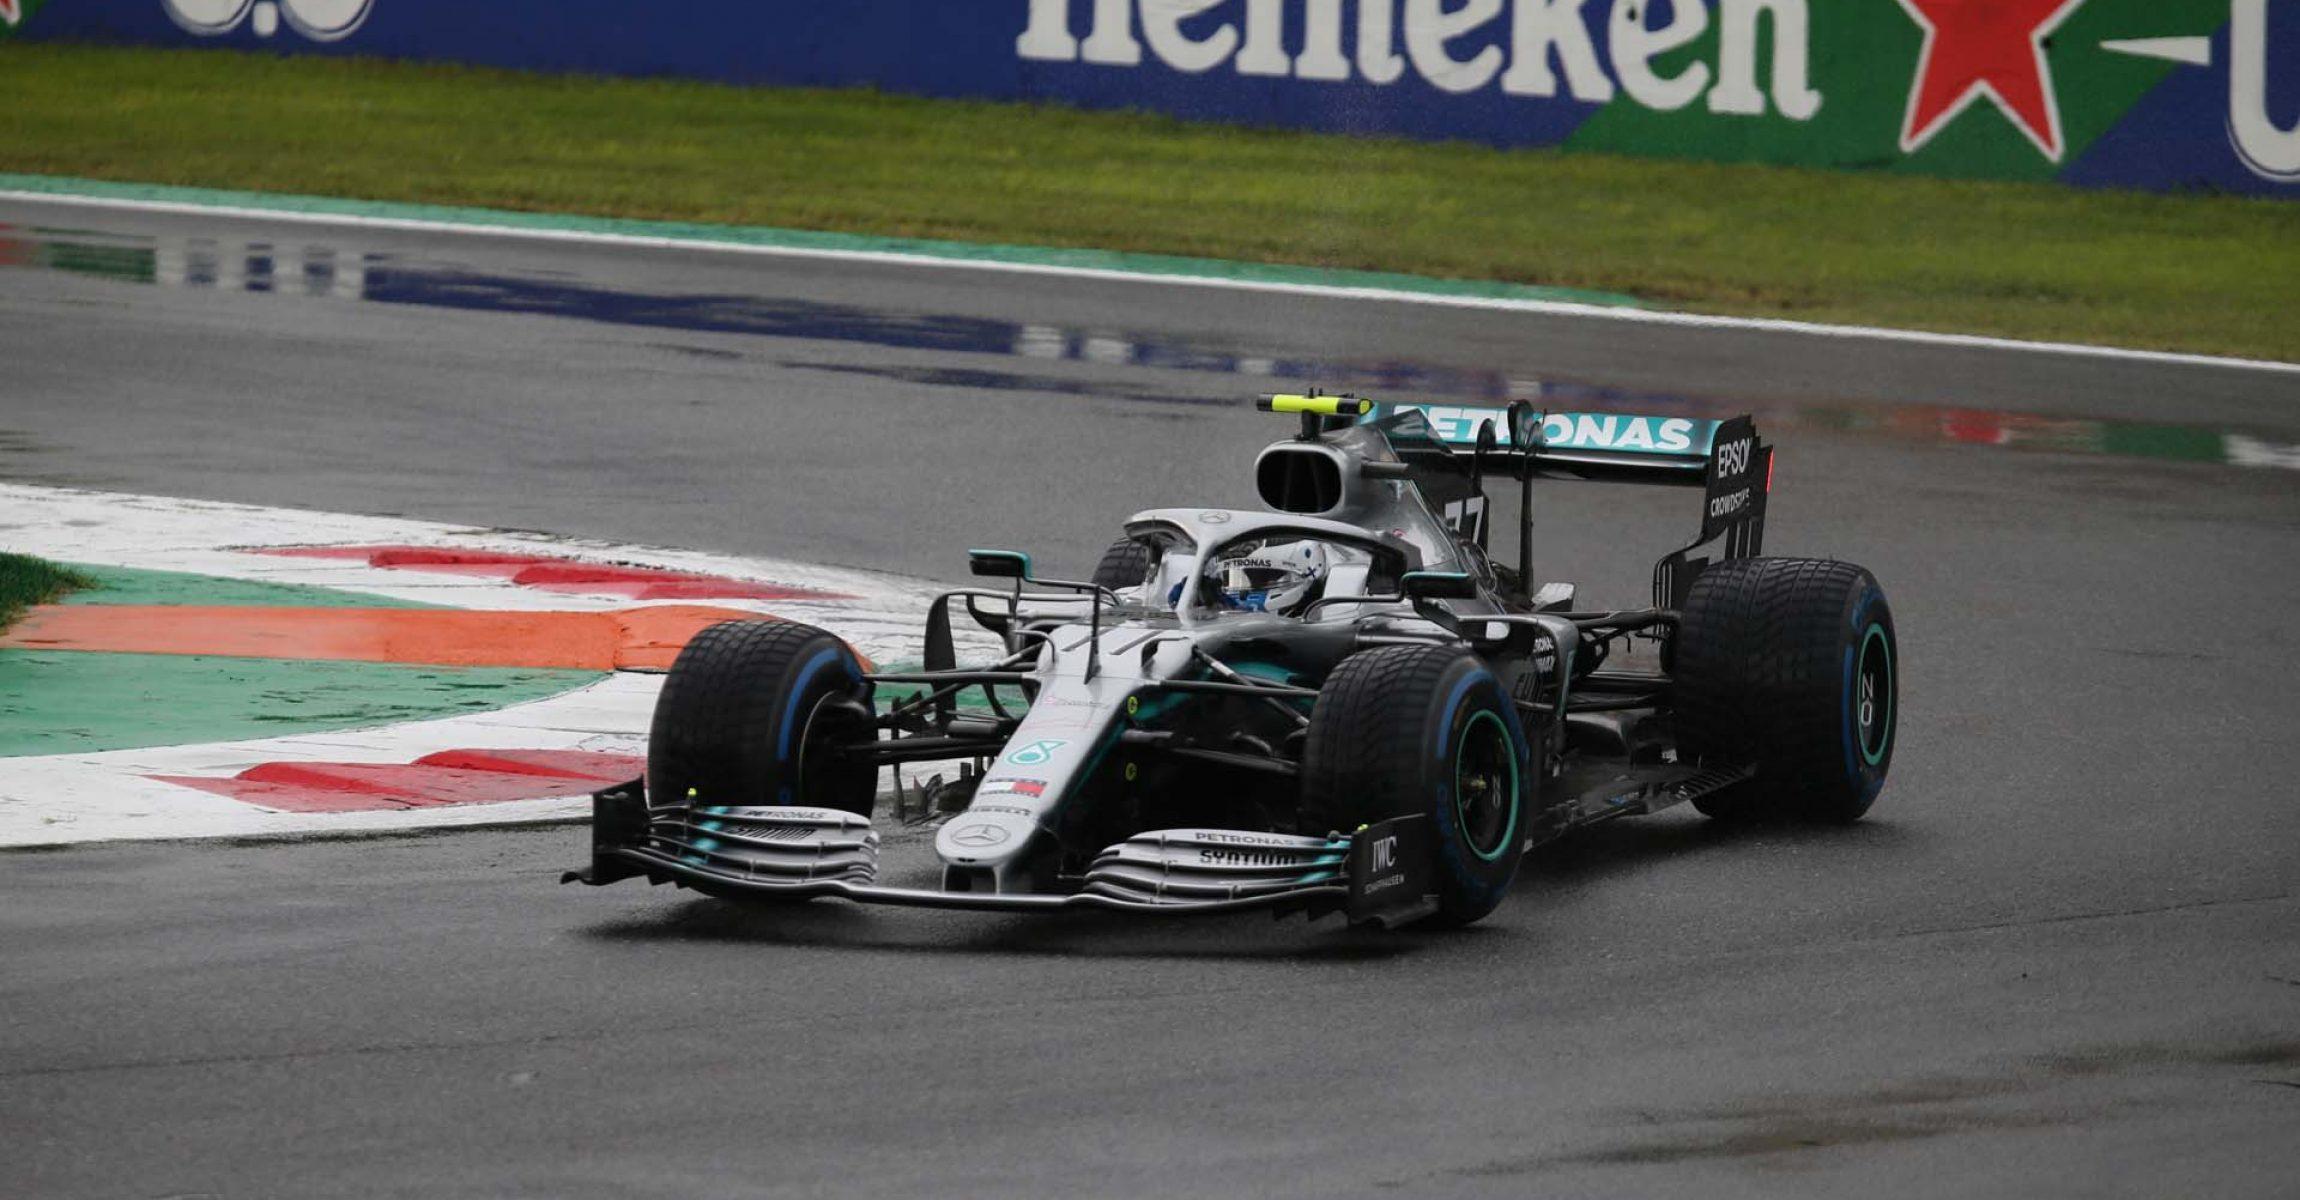 Italian Grand Prix 2019, Monza, Friday, Valtteri Bottas Mercedes